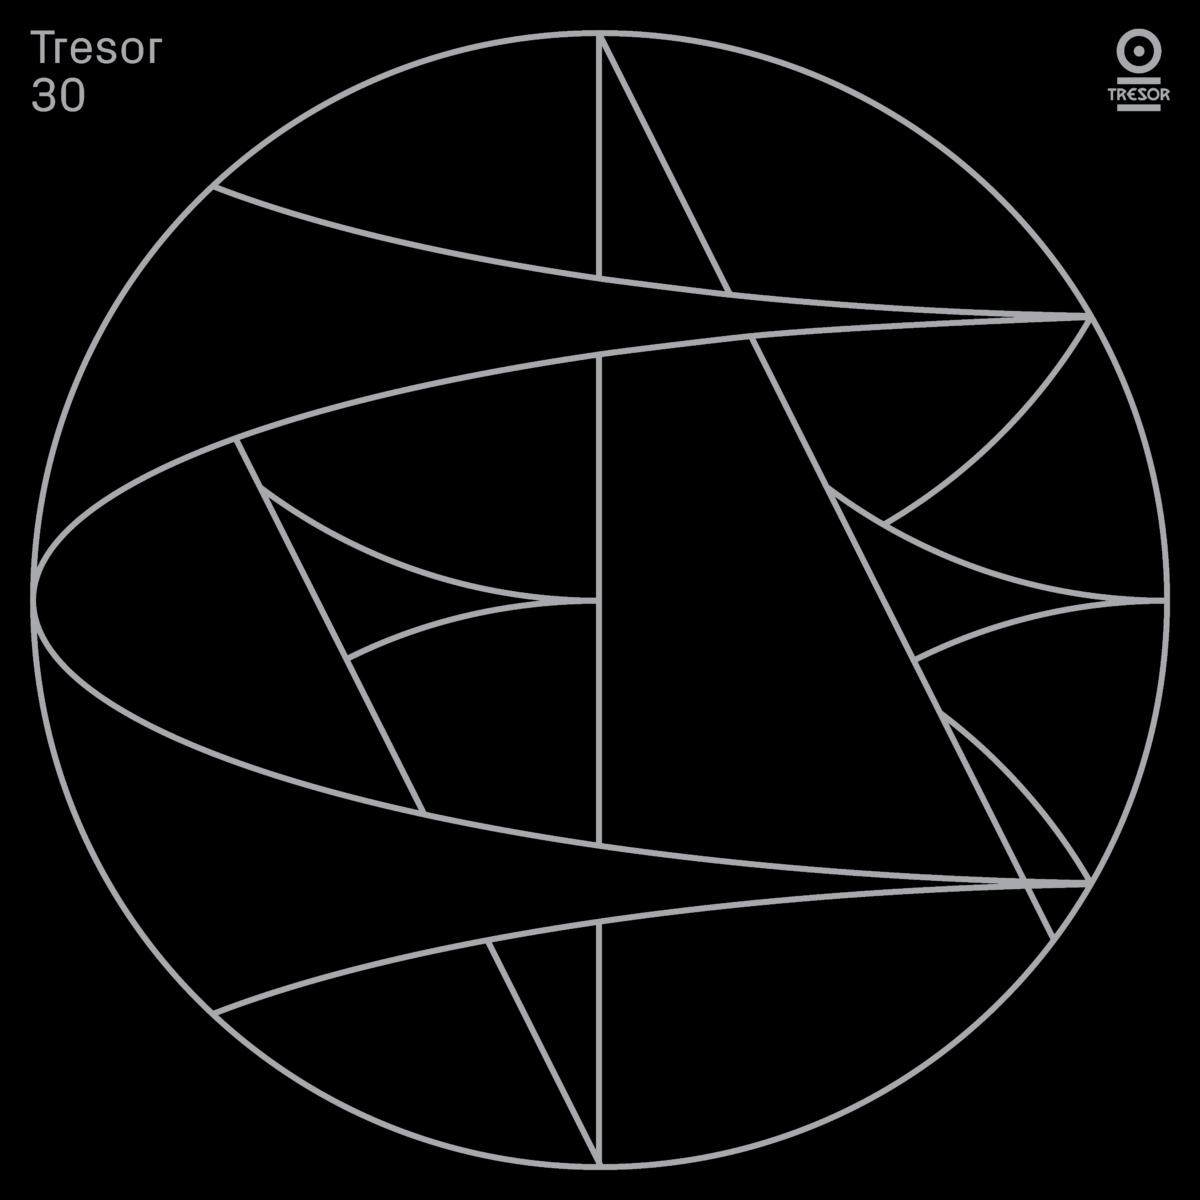 Artwork compilation TRESOR 30